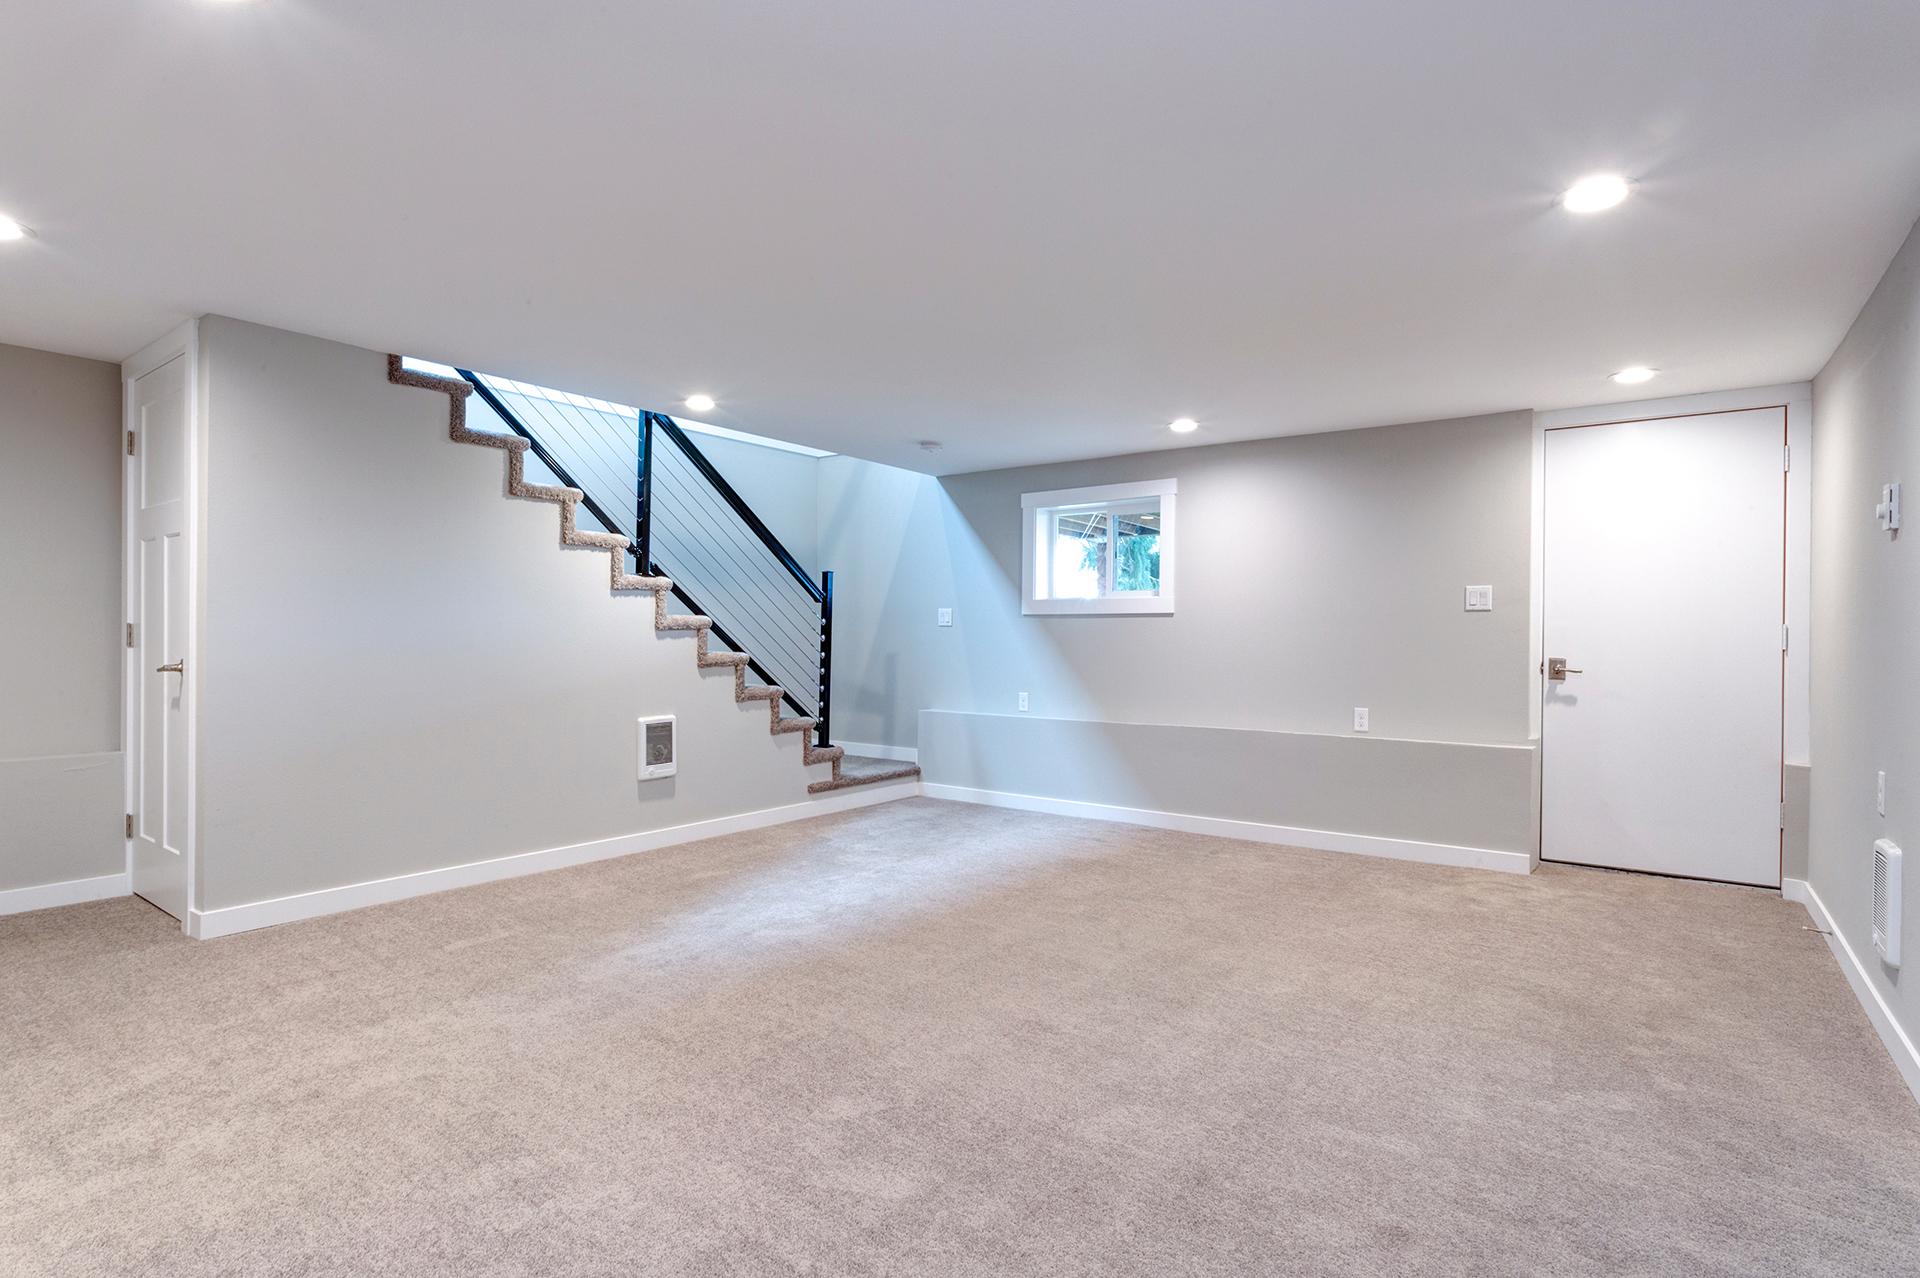 northern michigan waterproof basement